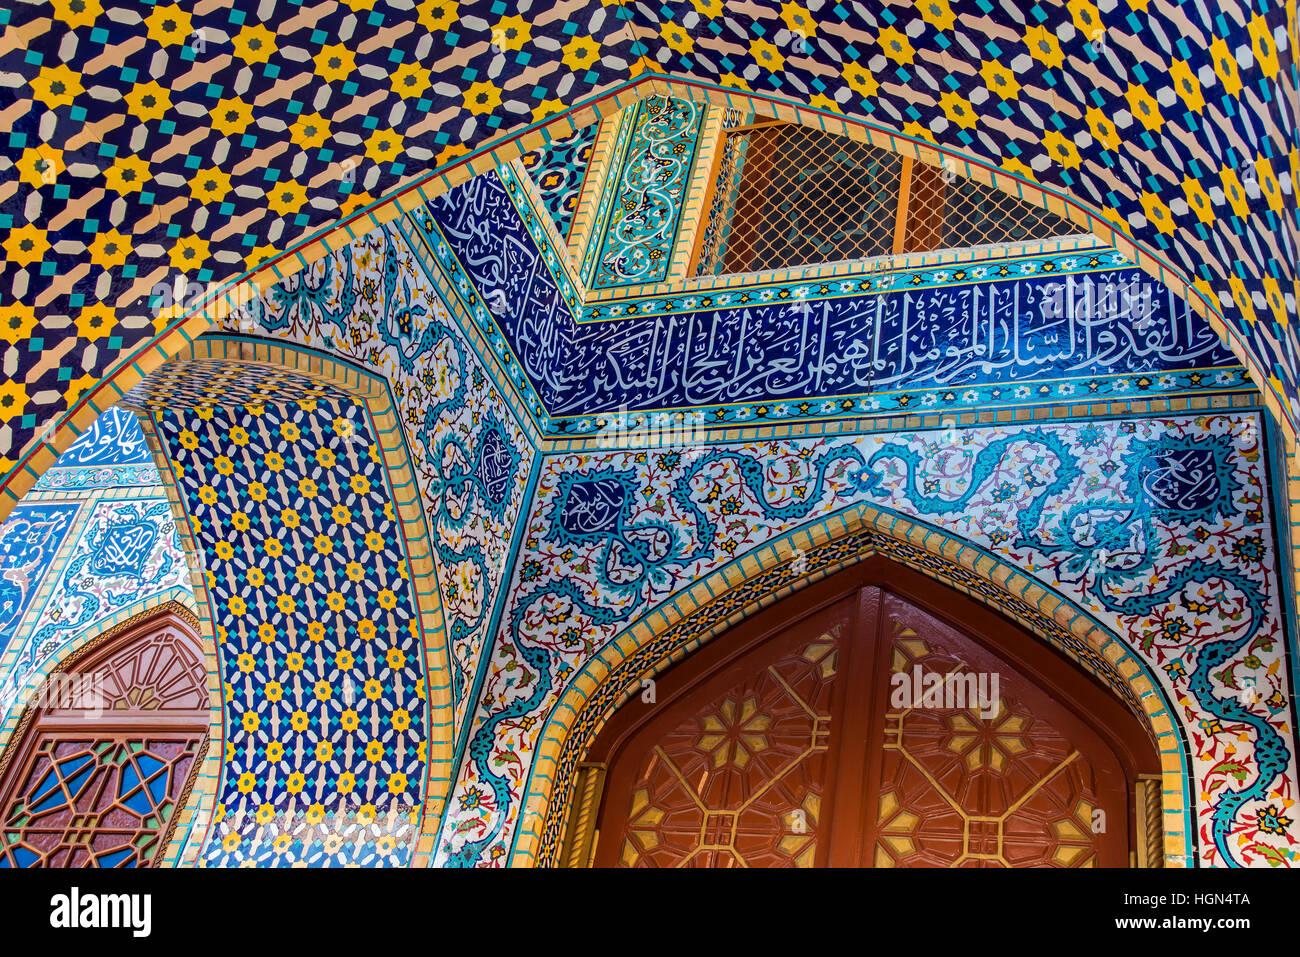 Iranian Mosque, Dubai, United Arab Emirates - Stock Image